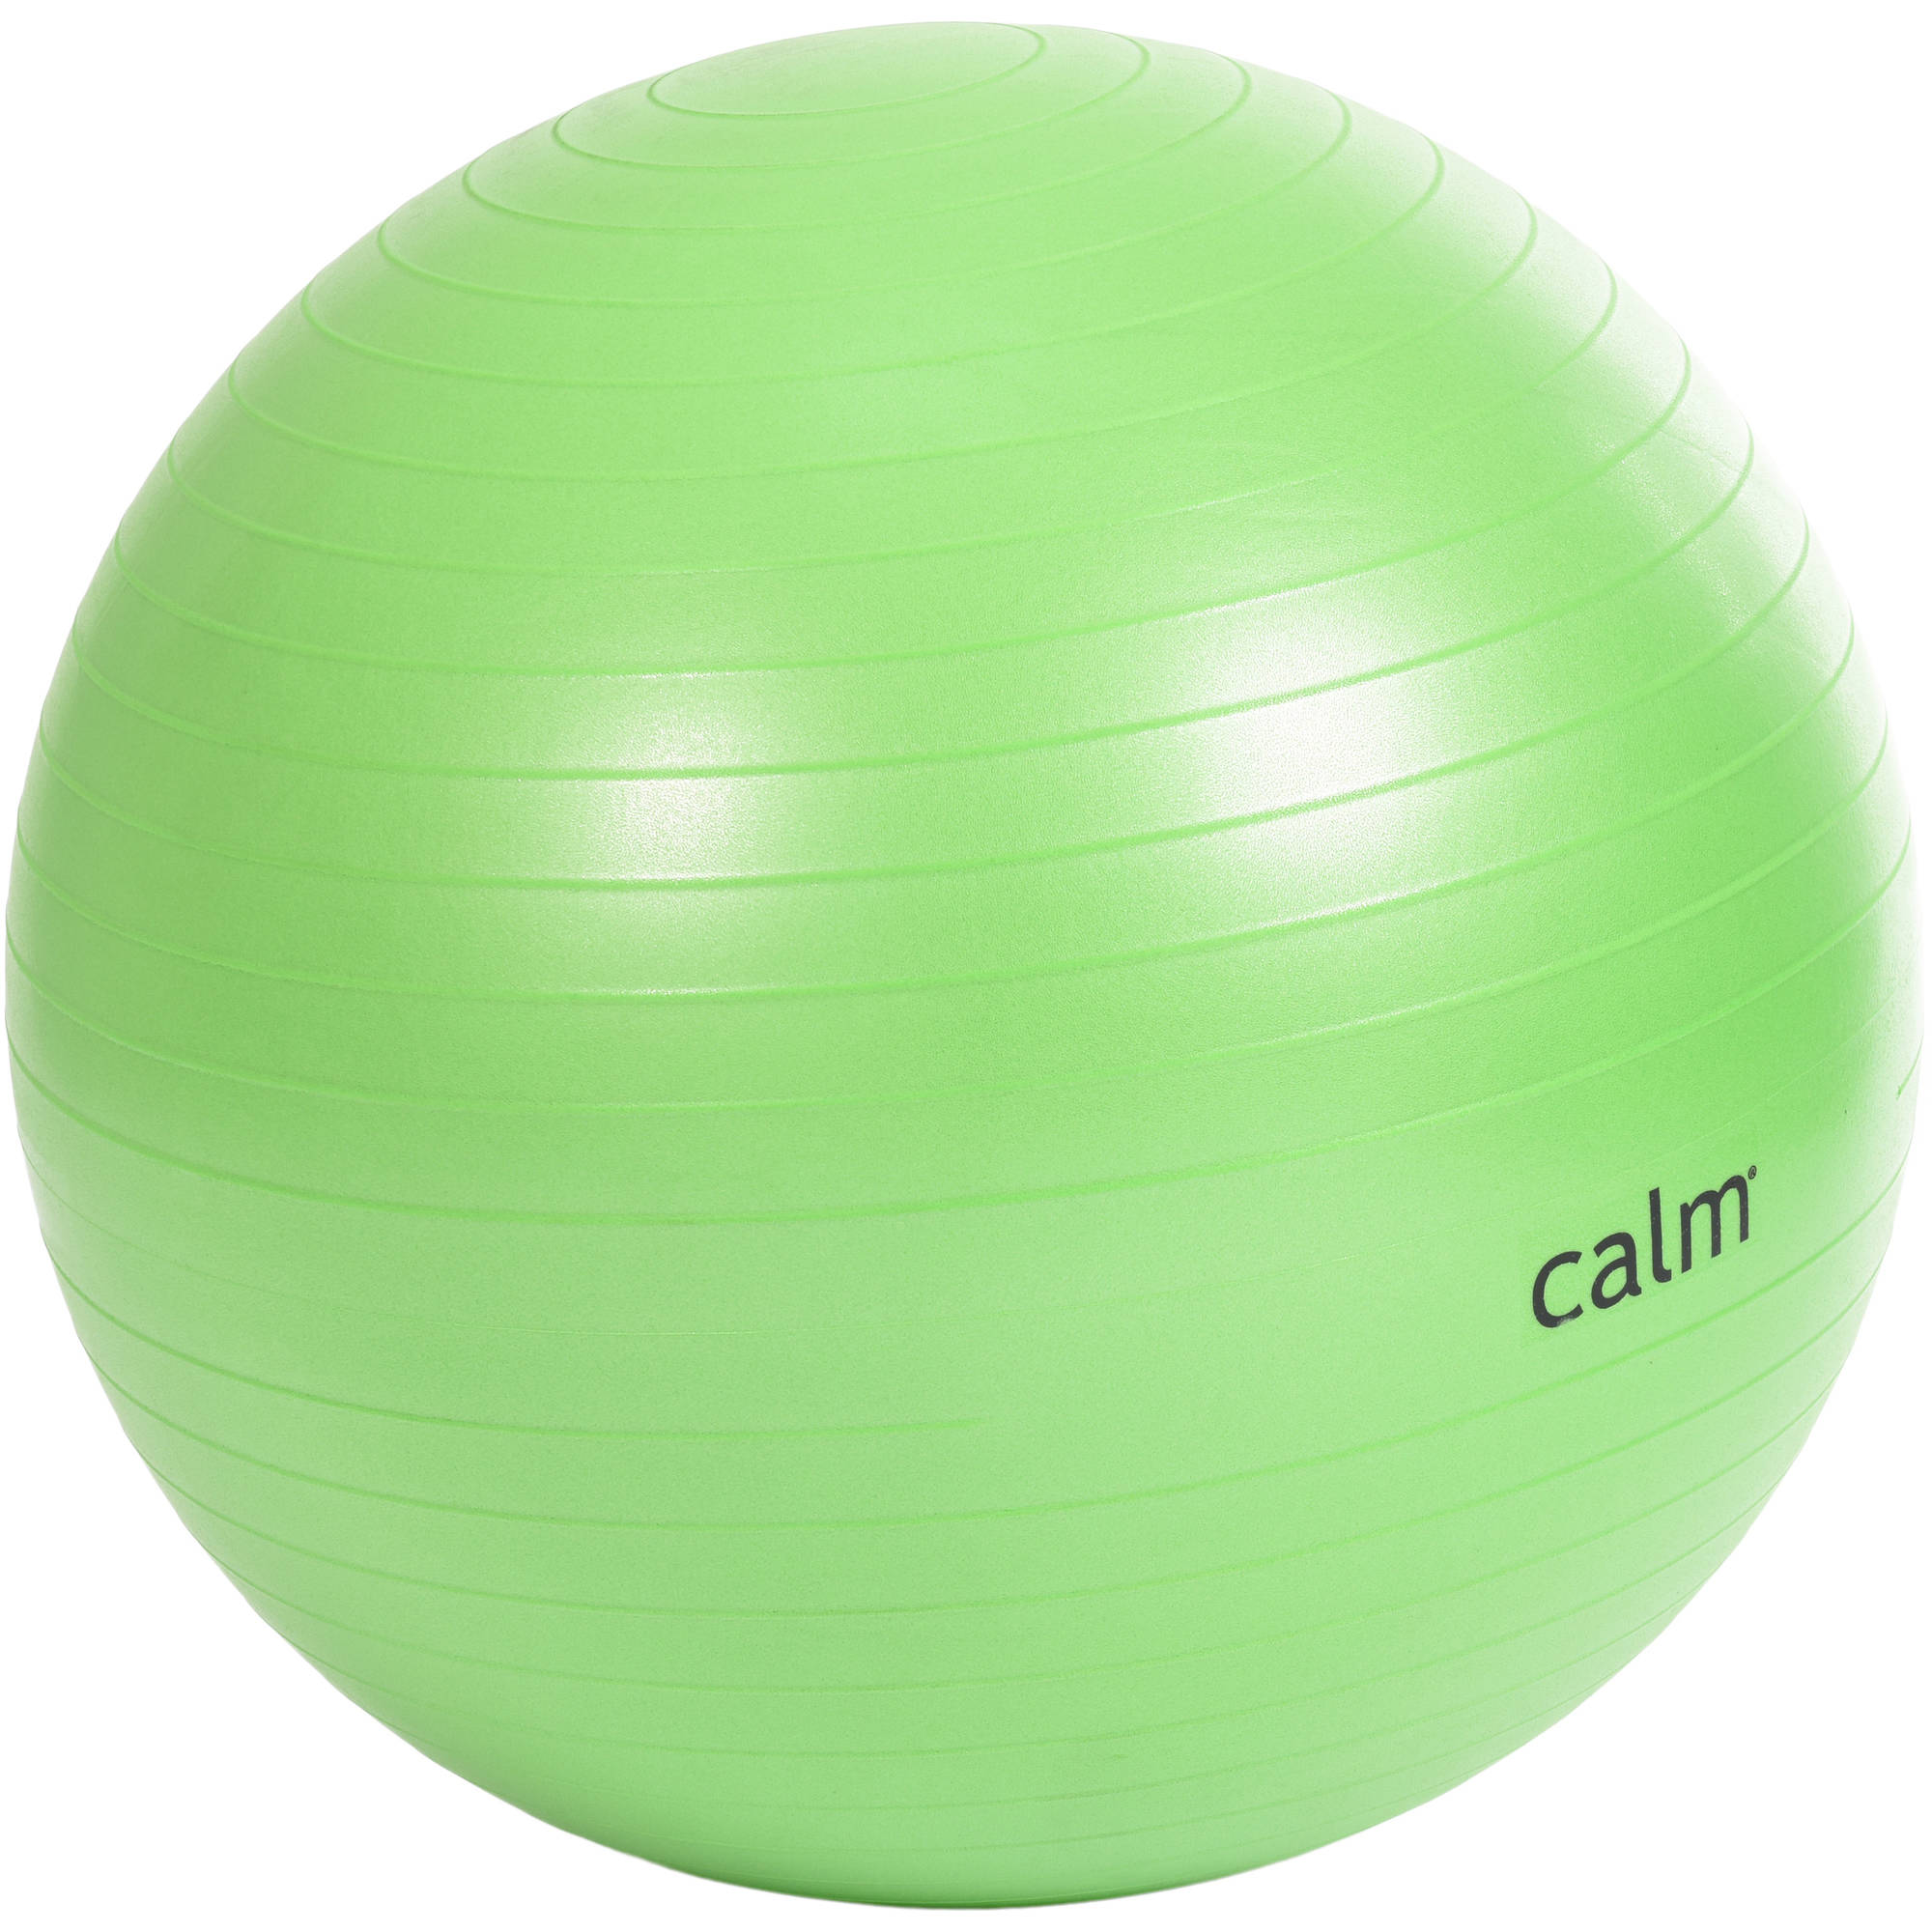 Calm 65 cm Anti-Burst Body Ball